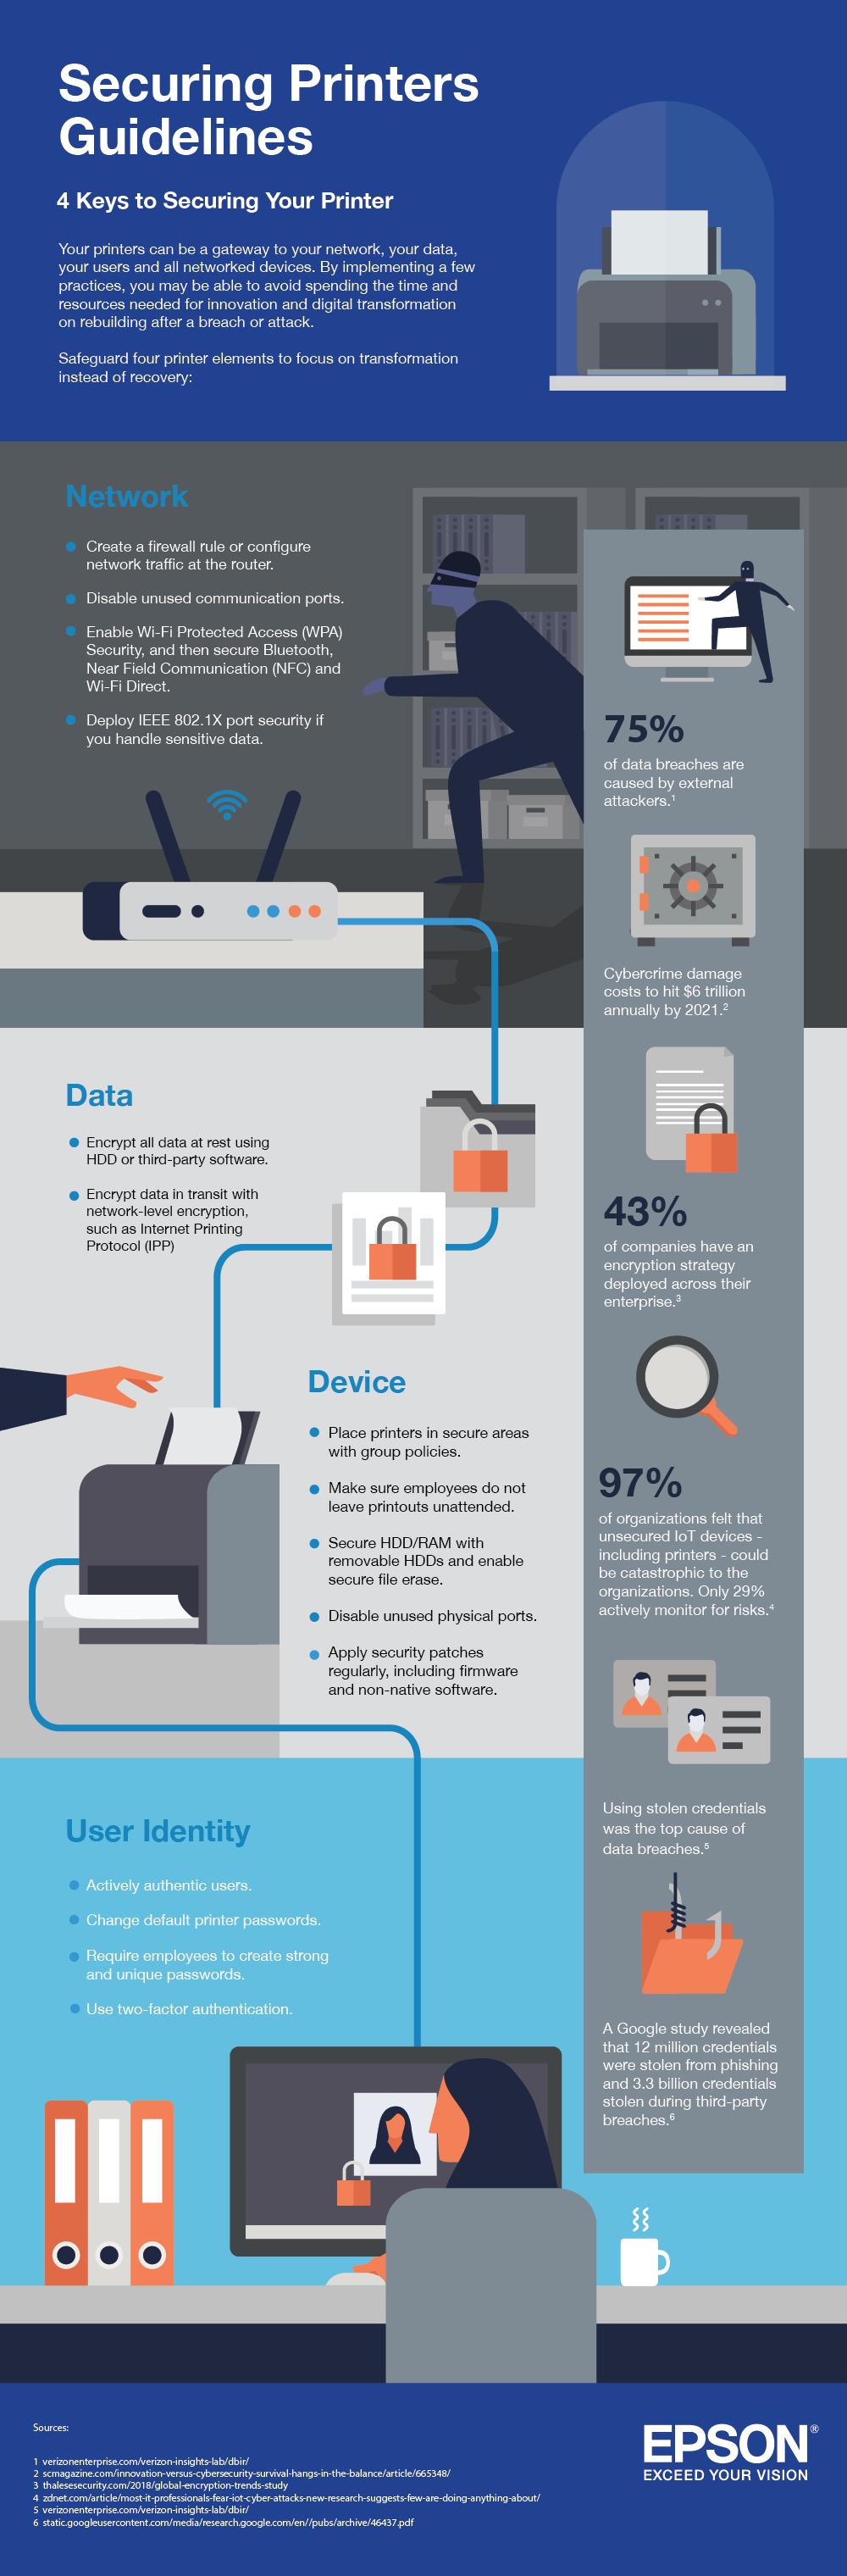 4 Keys to Printer Network Security_Epson